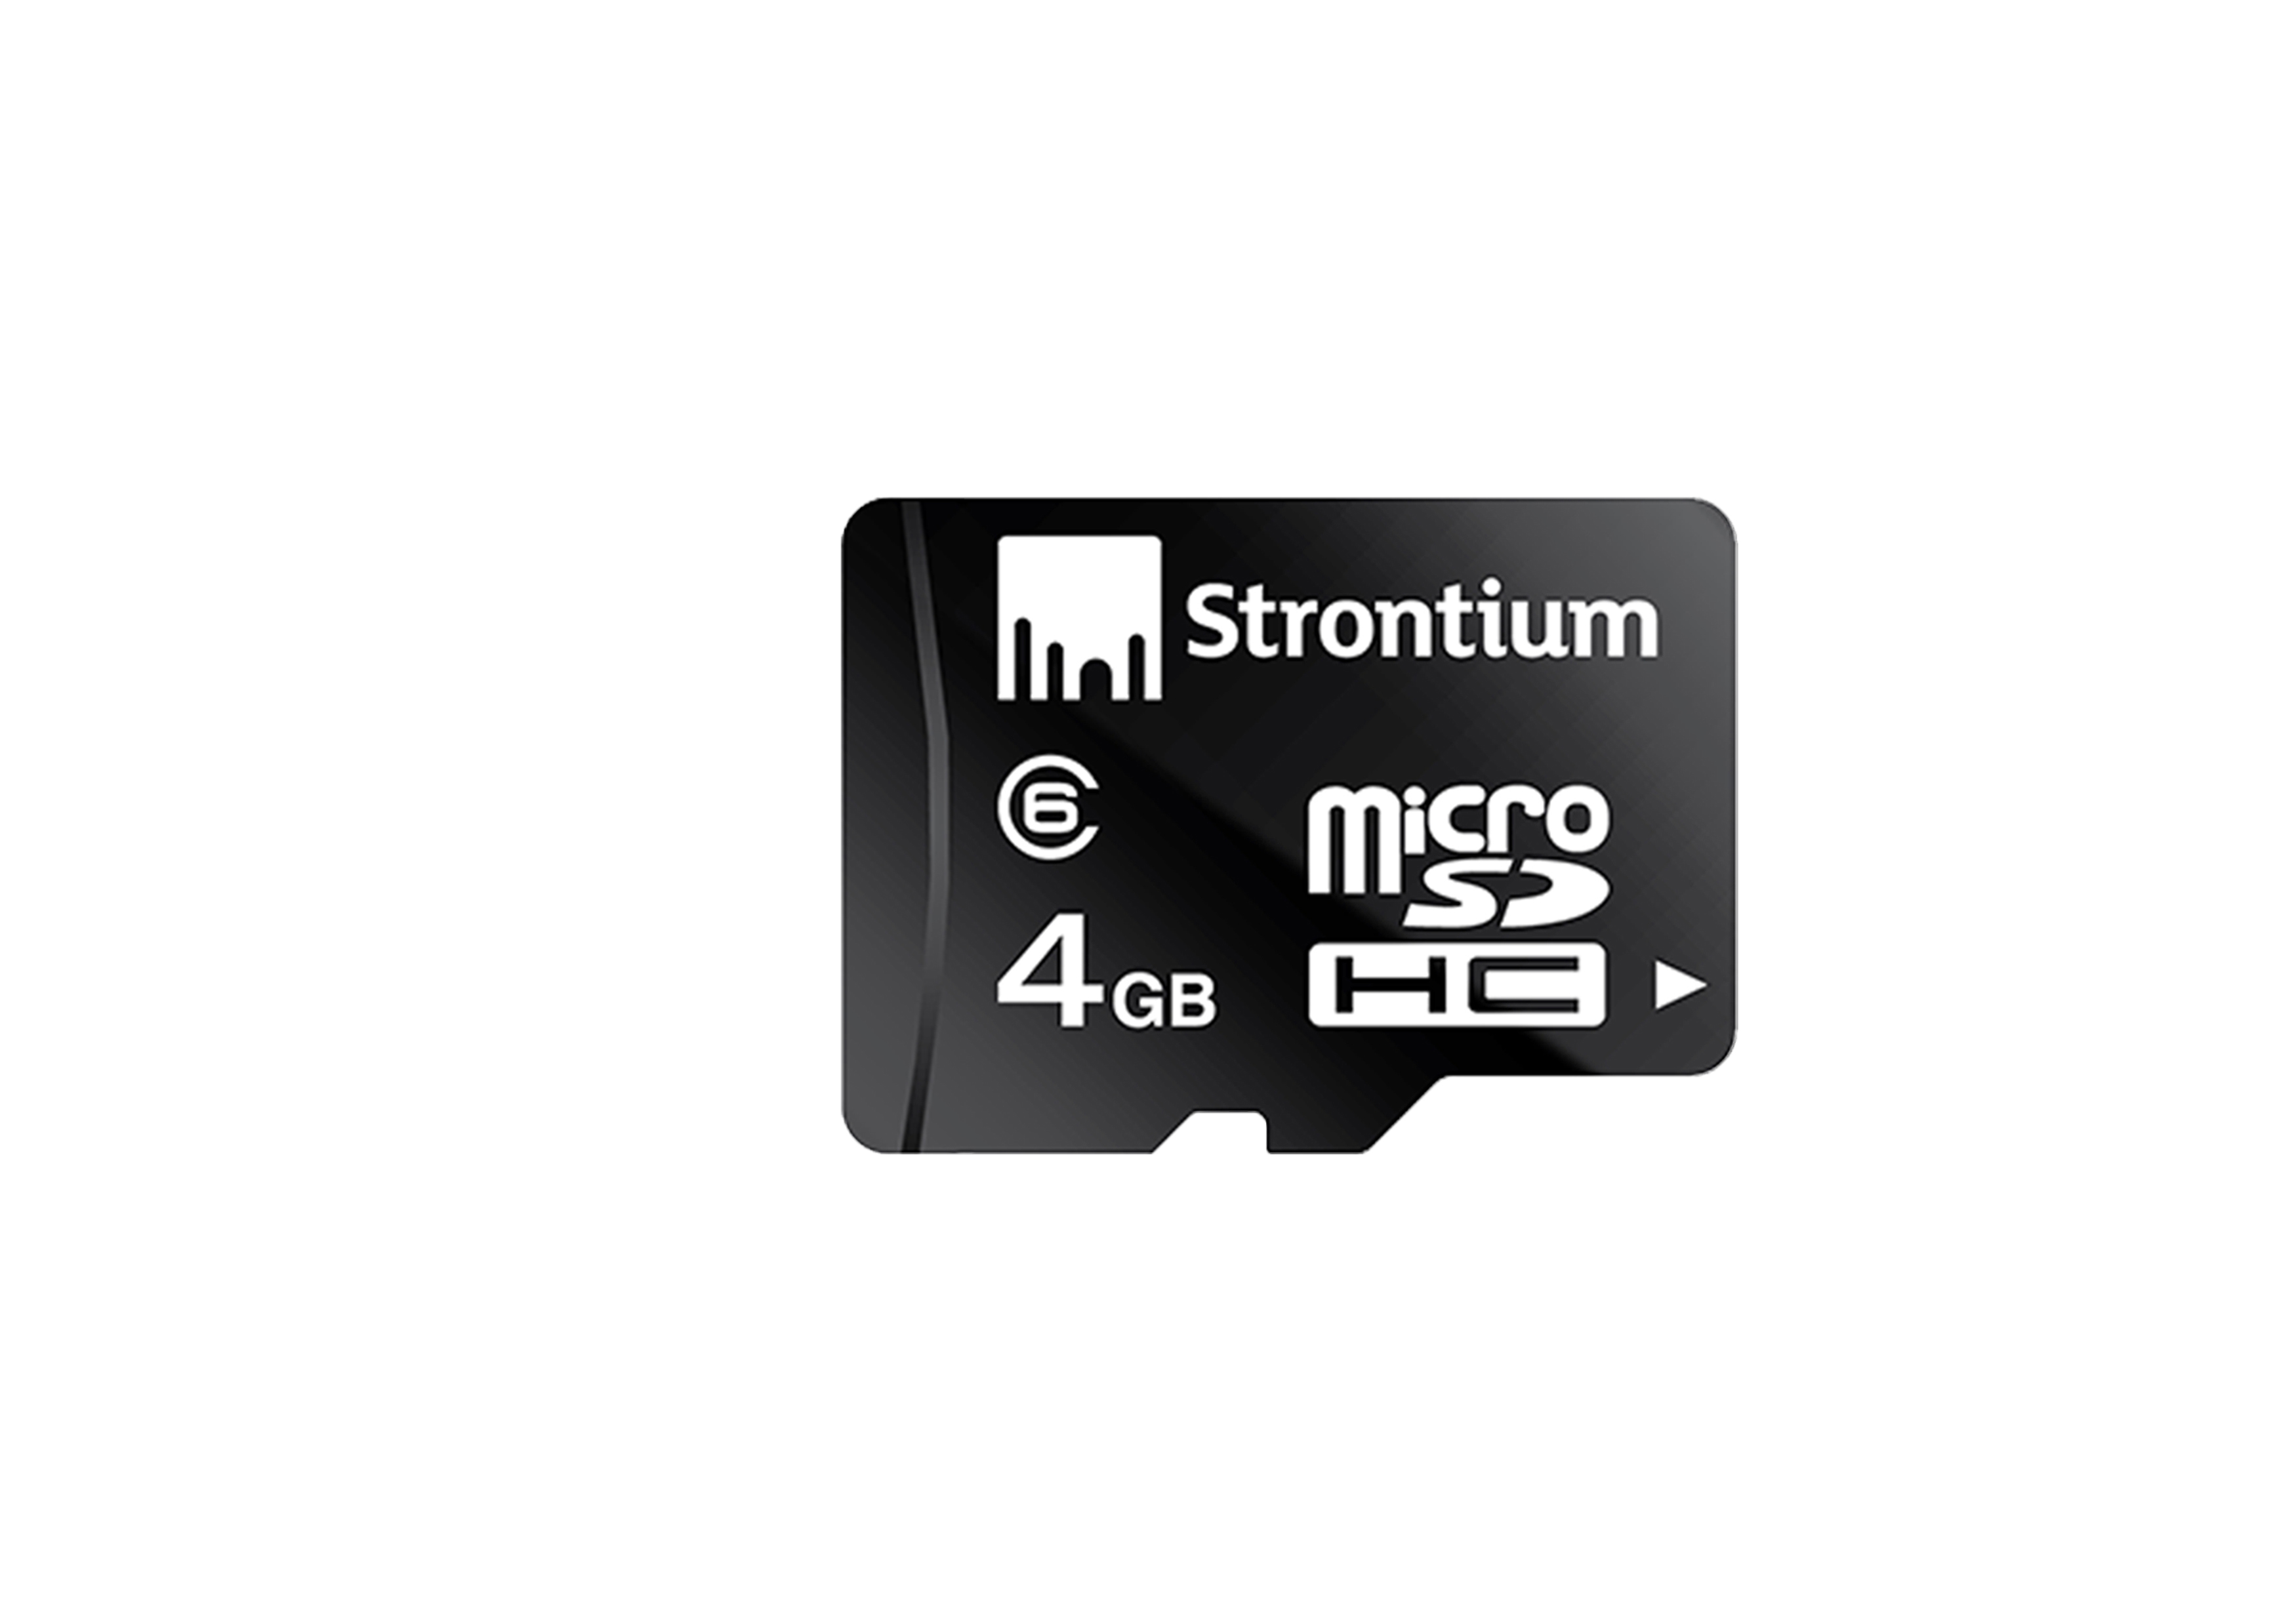 Micro Sd Karte 4gb.Mobile Memory Cards Performance Mobile Memory Cards